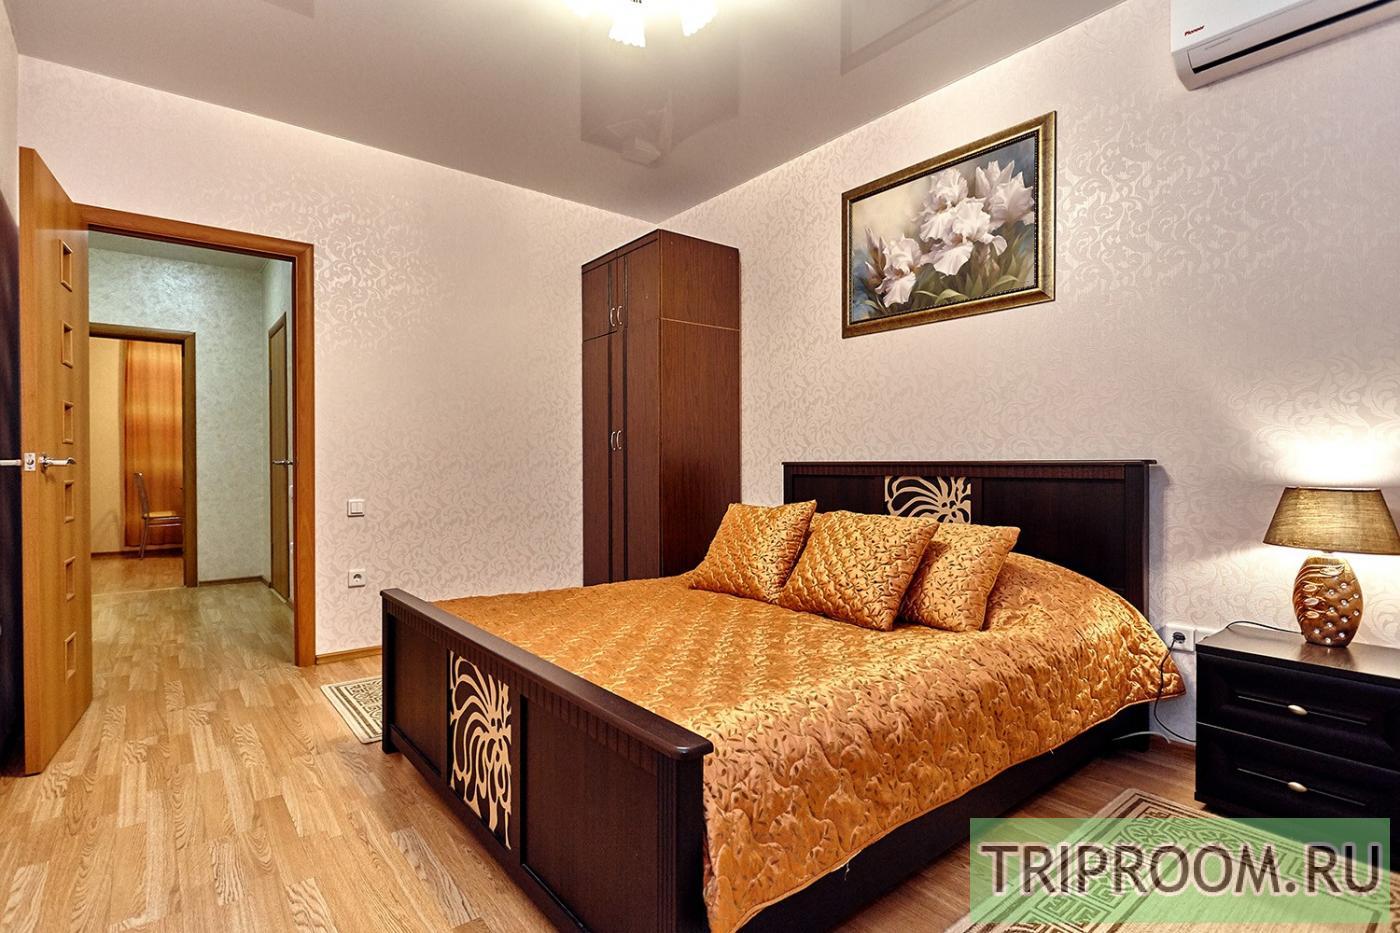 2-комнатная квартира посуточно (вариант № 10581), ул. Соколова улица, фото № 2